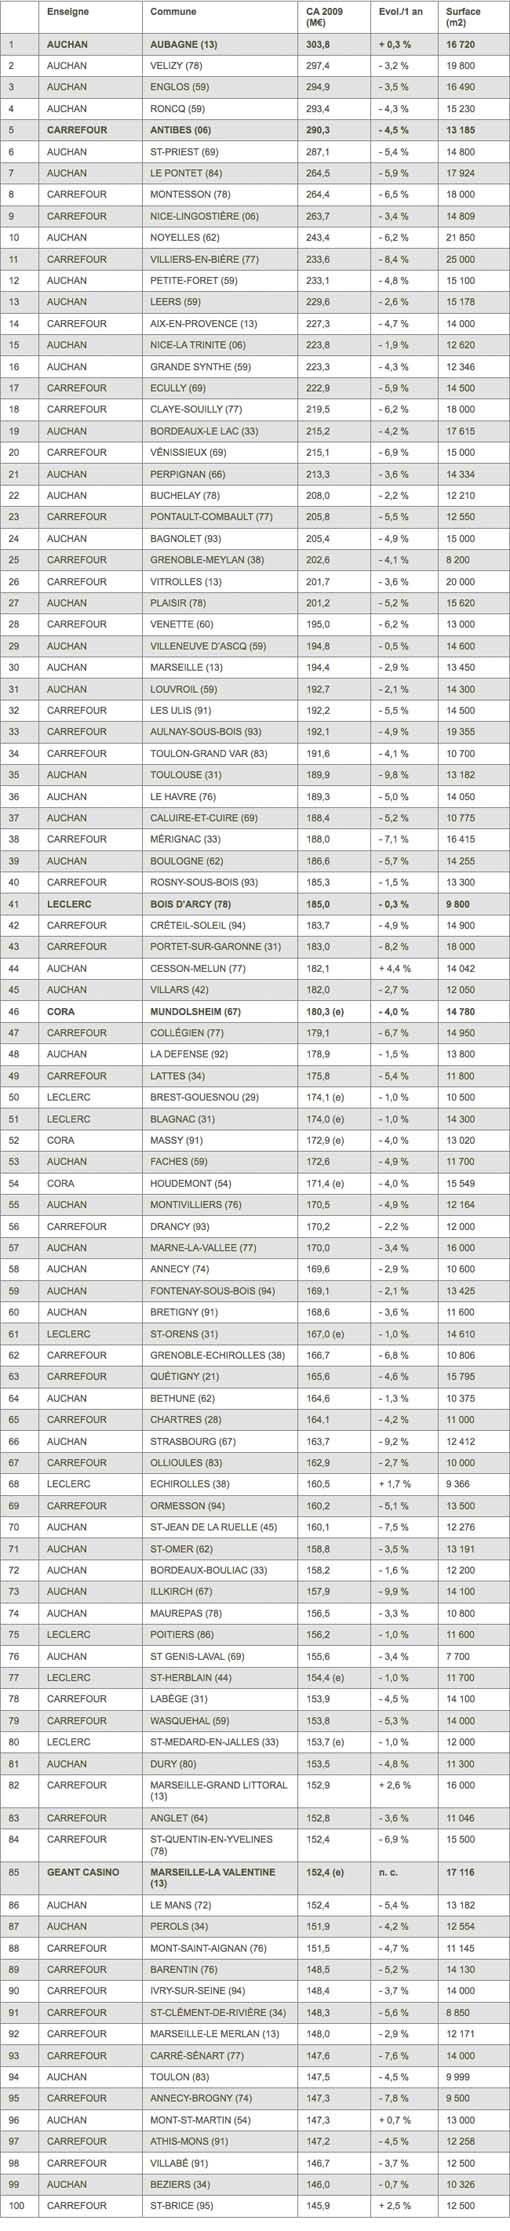 Top 100 HM France 2010